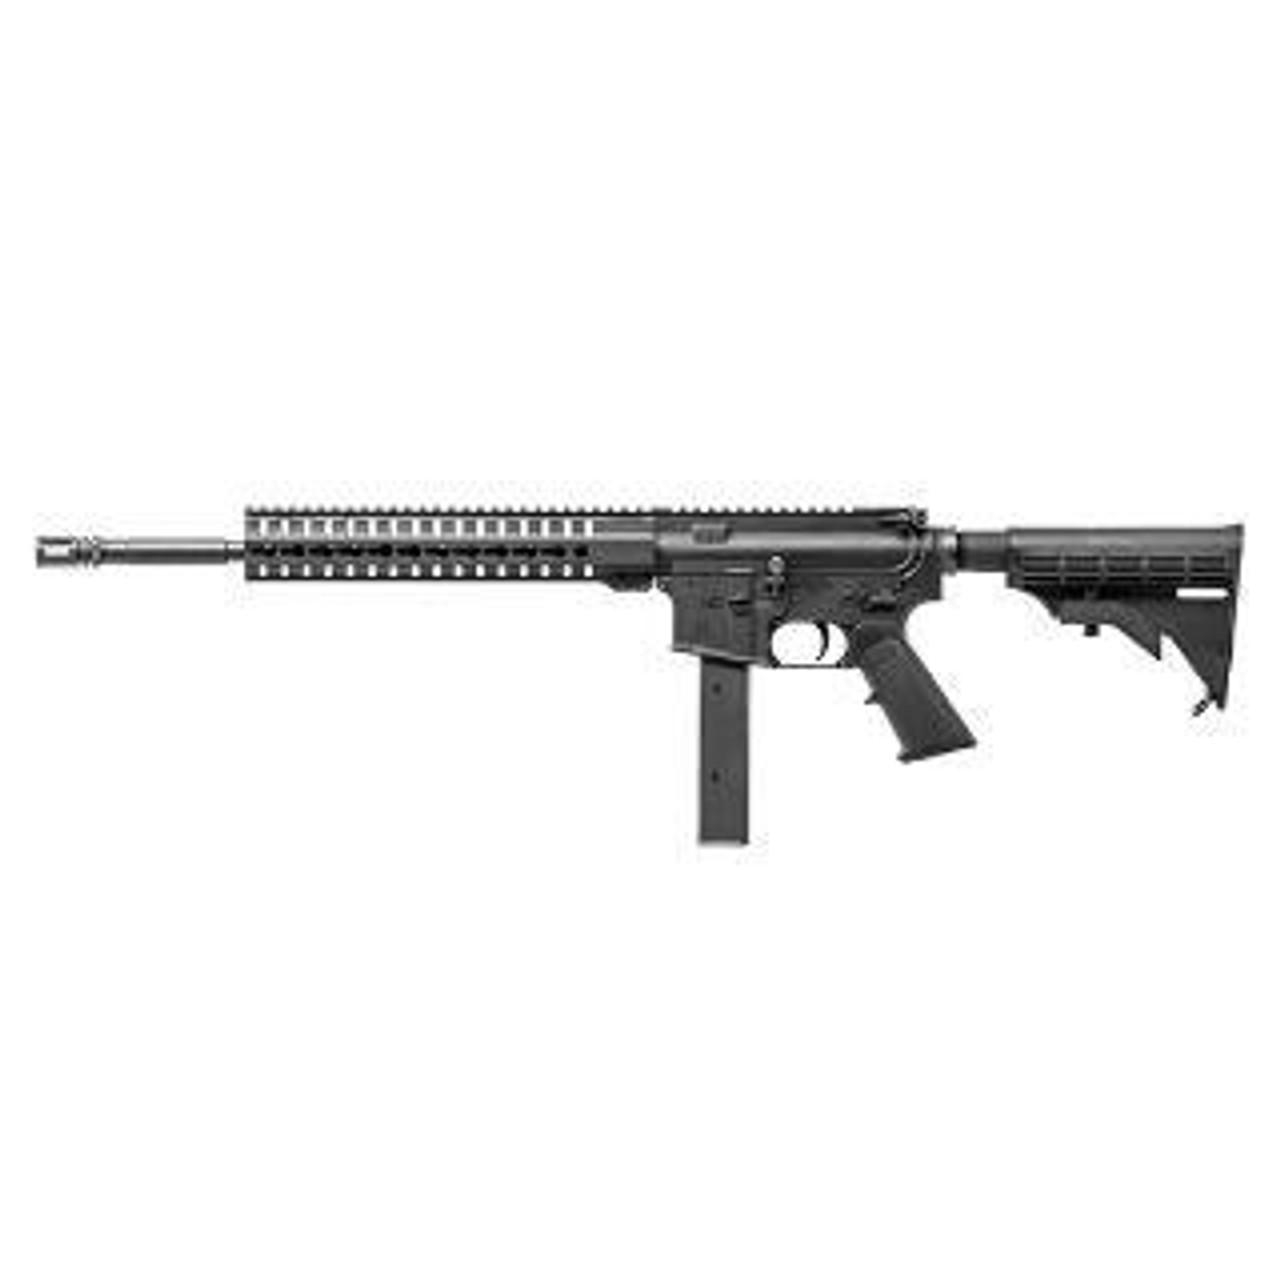 CMMG Mk9 T M4LE CALIFORNIA LEGAL -9mm